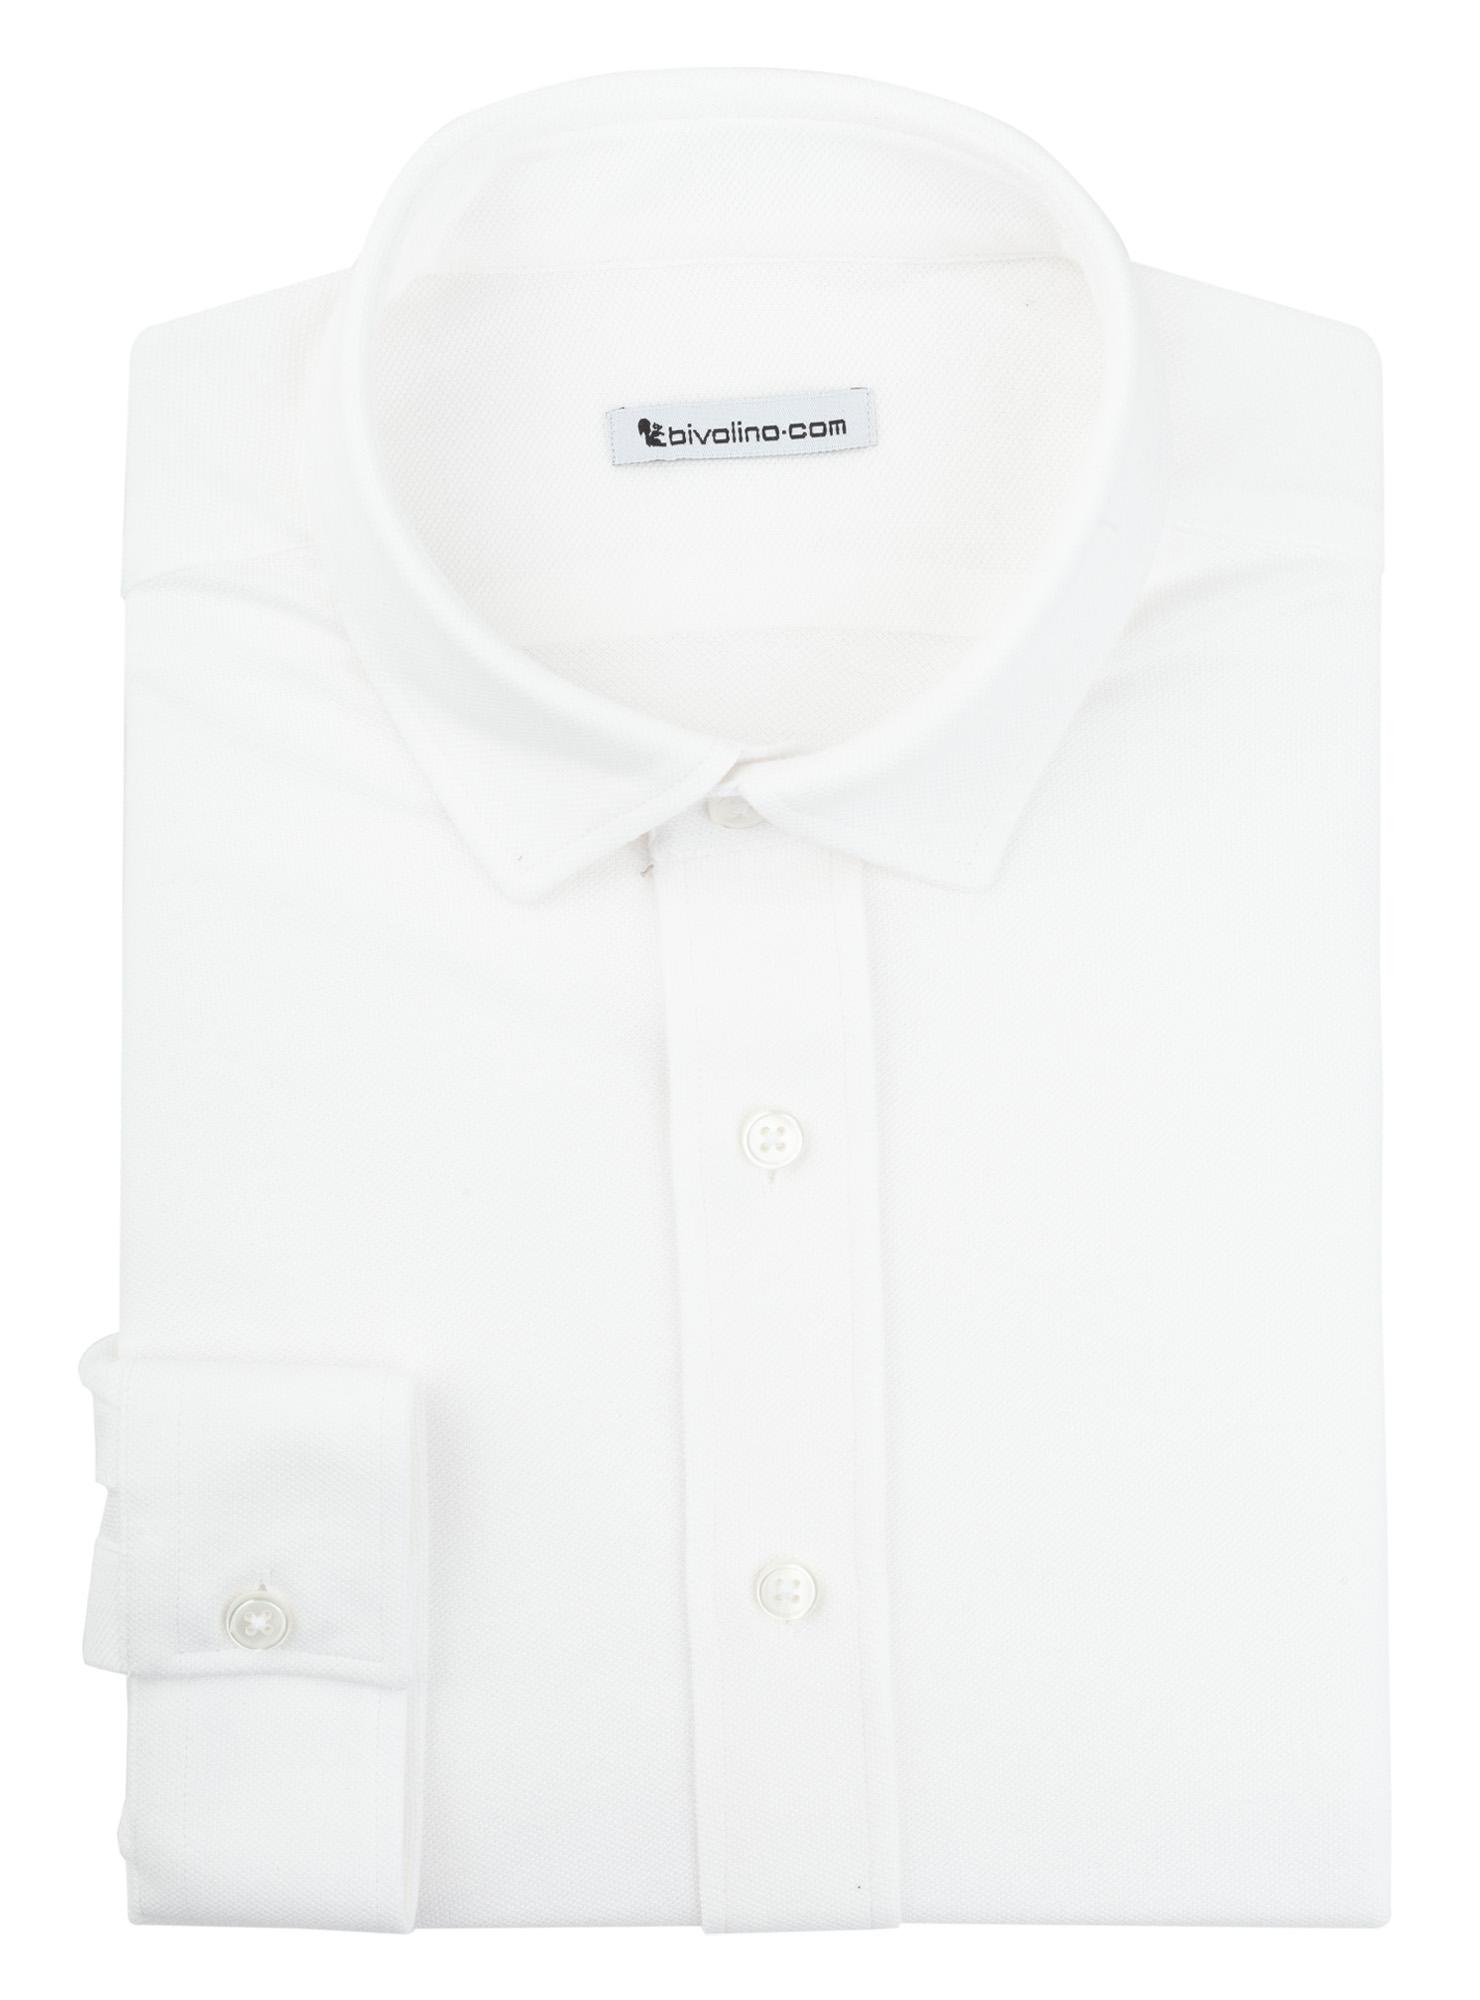 JERSILIONI - 100% coton piqué Jersey blanc  JERSILI 1